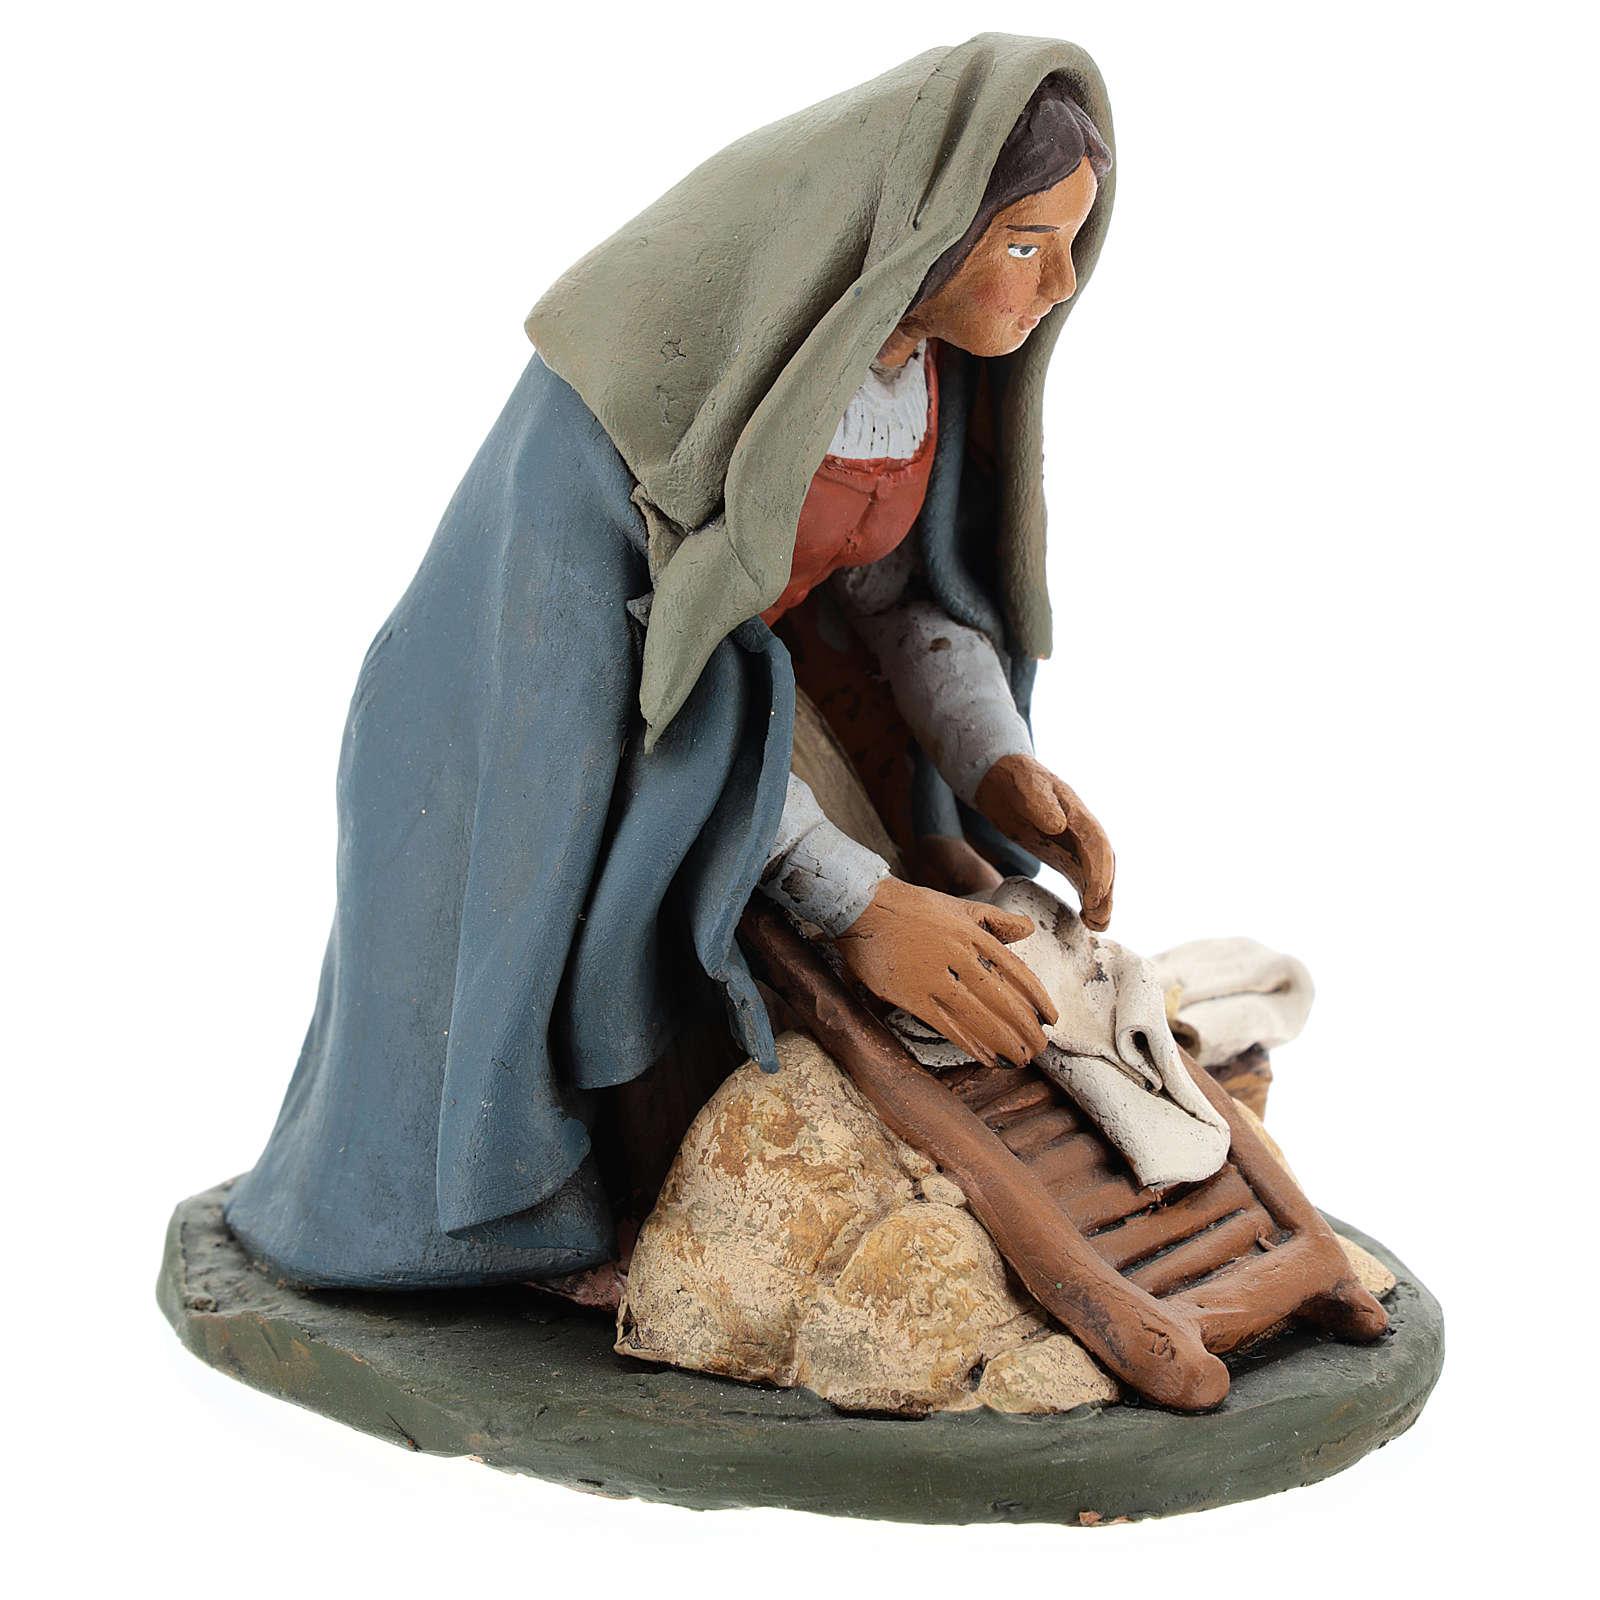 Naitivity set accessory, Washerwoman clay figurine 4